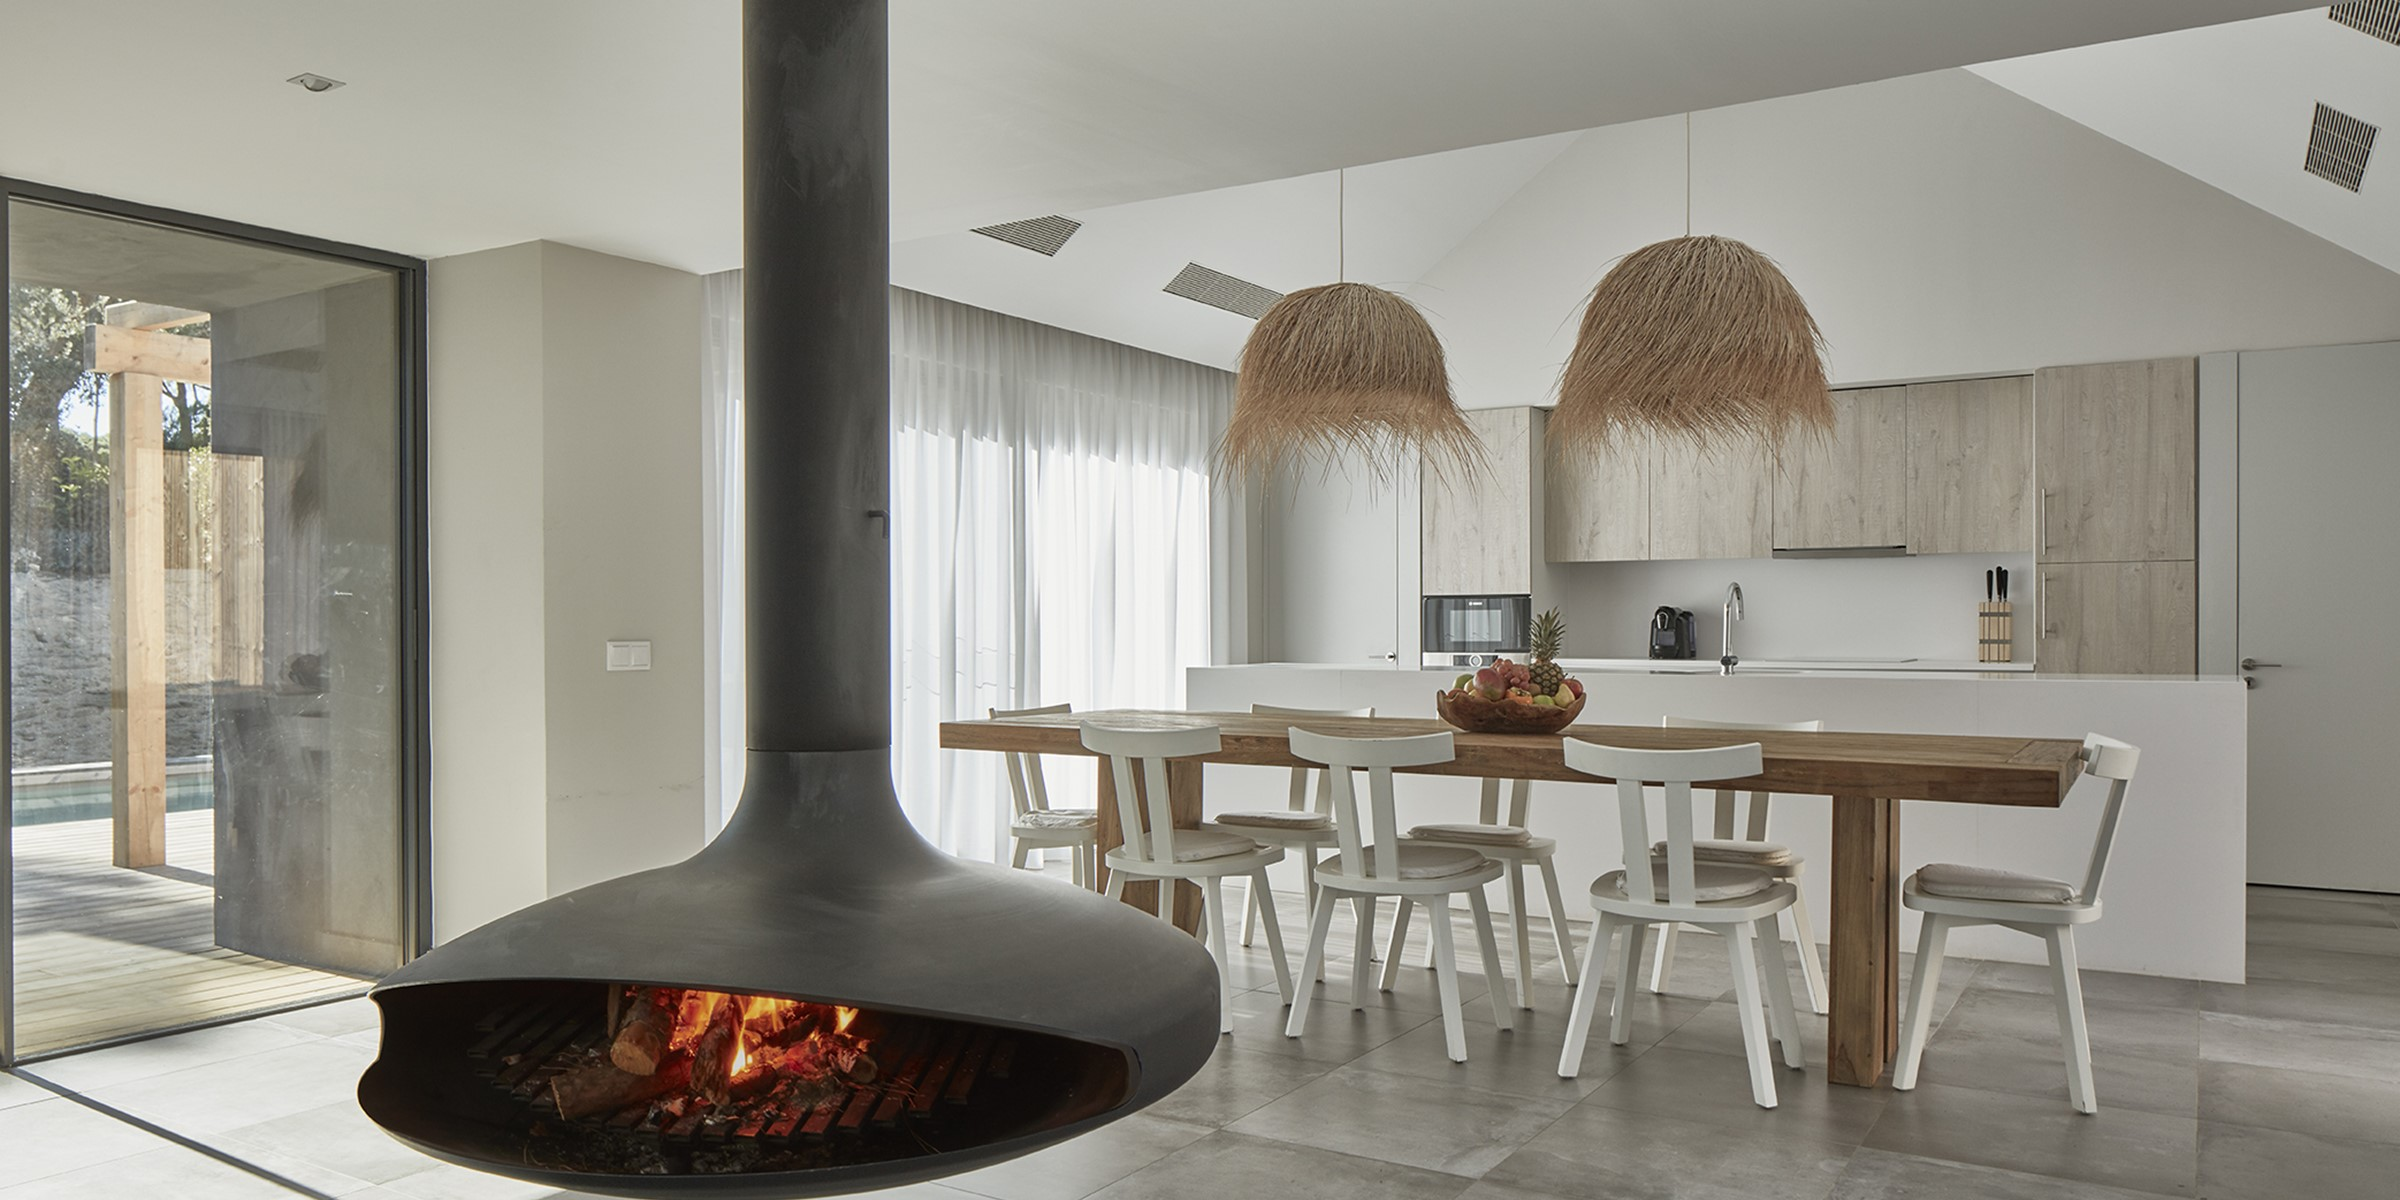 Villa Sublime Comporta Living Room Kitchen W Fire 0141 LR